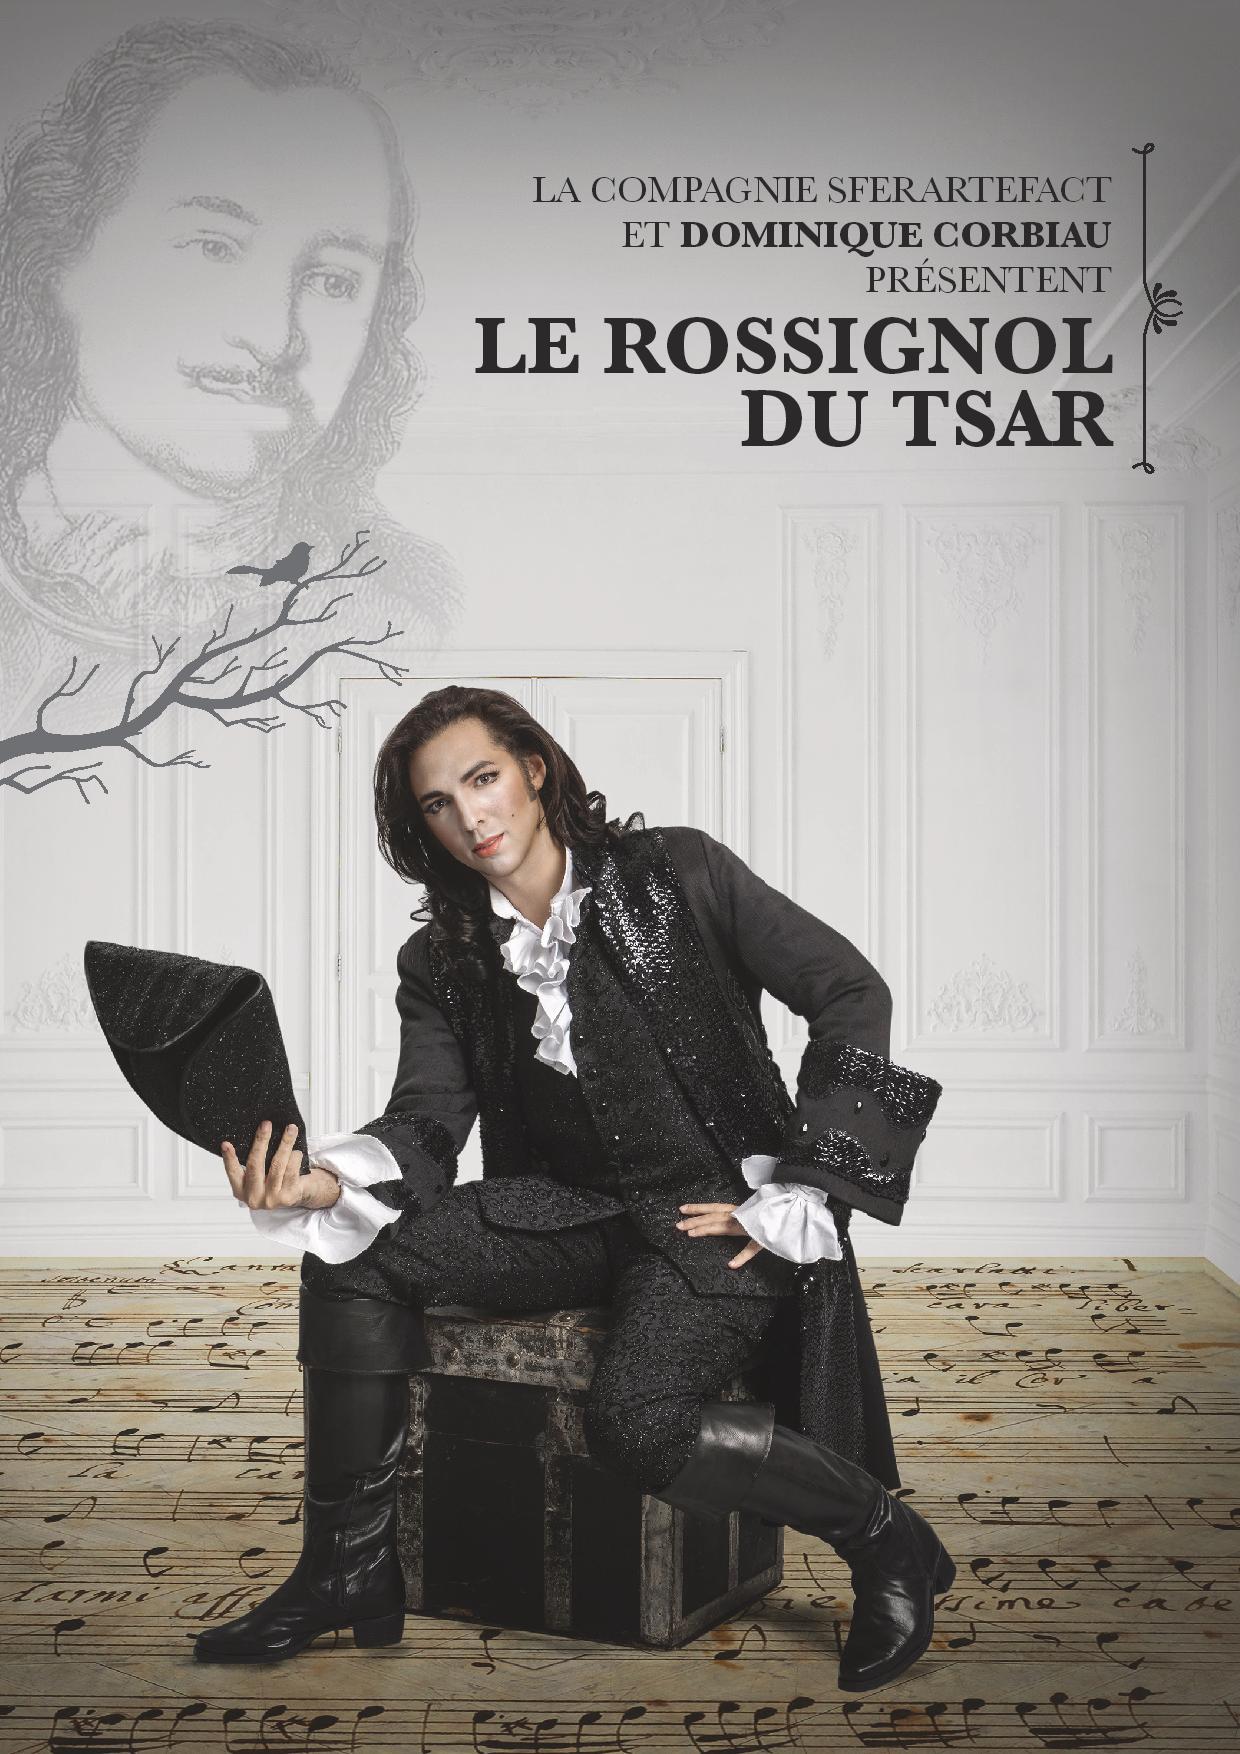 Tsar-Corbiau affiche-txtcompagnie-page-001